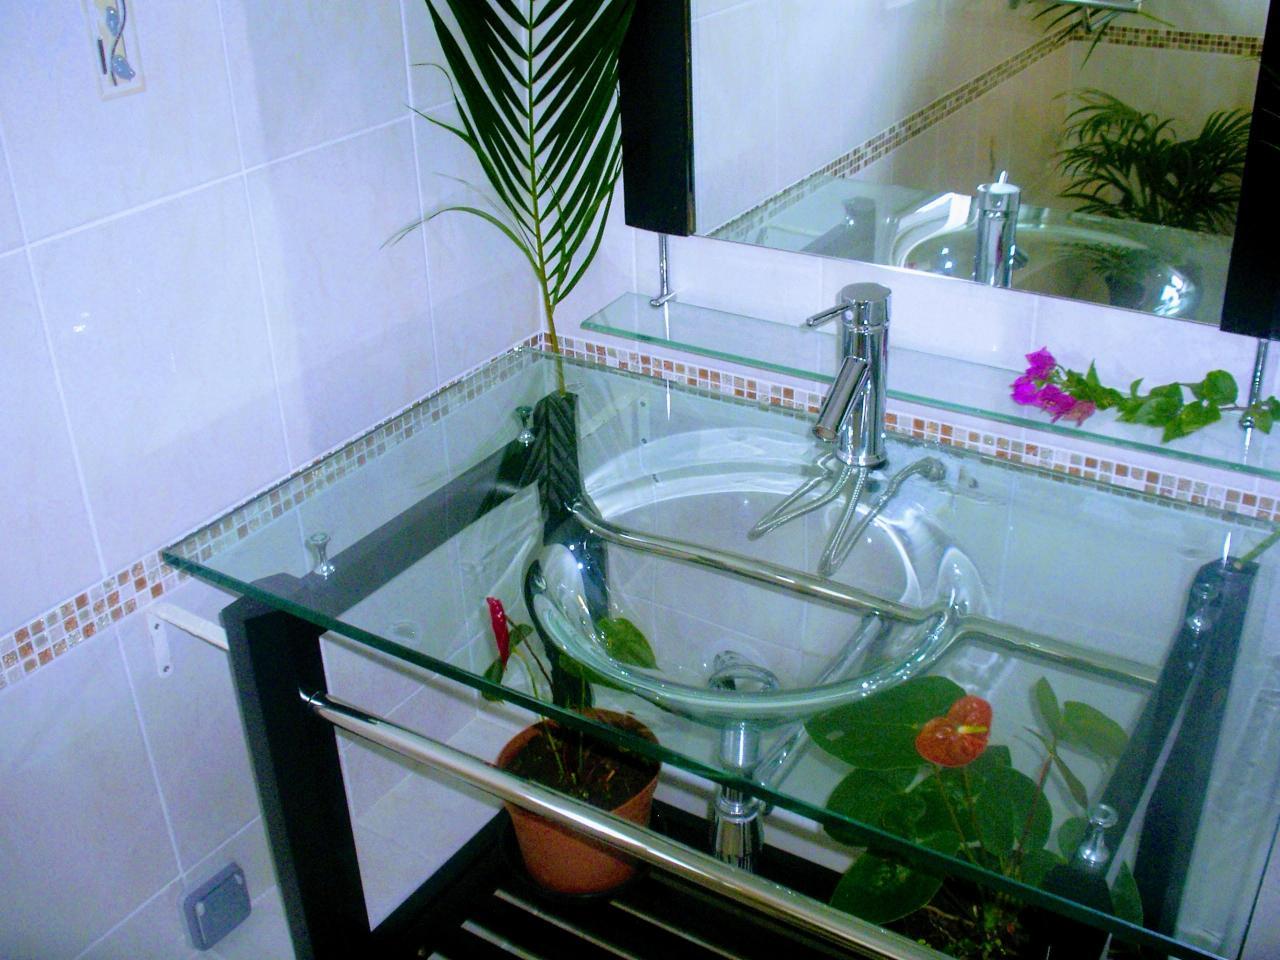 vasque de la salle de bain